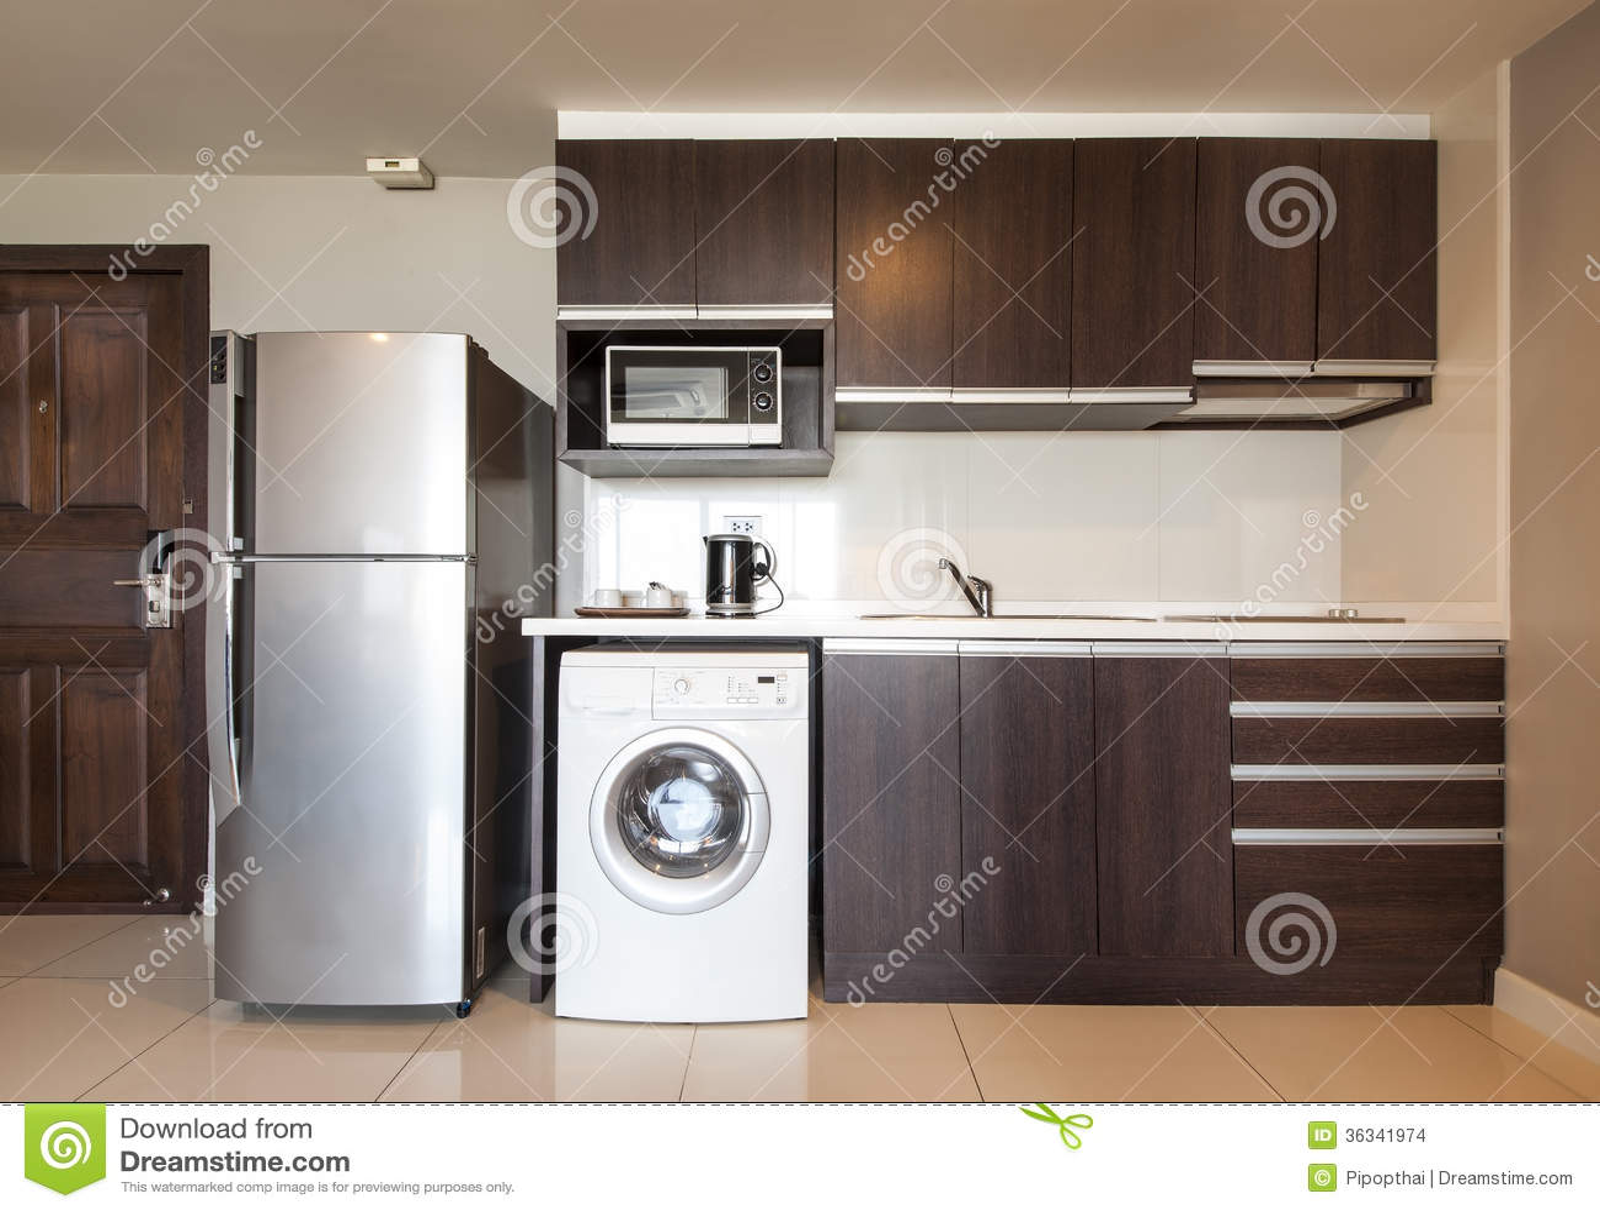 Emejing Cucine Con Frigo A Vista Ideas - Ameripest.us - ameripest.us